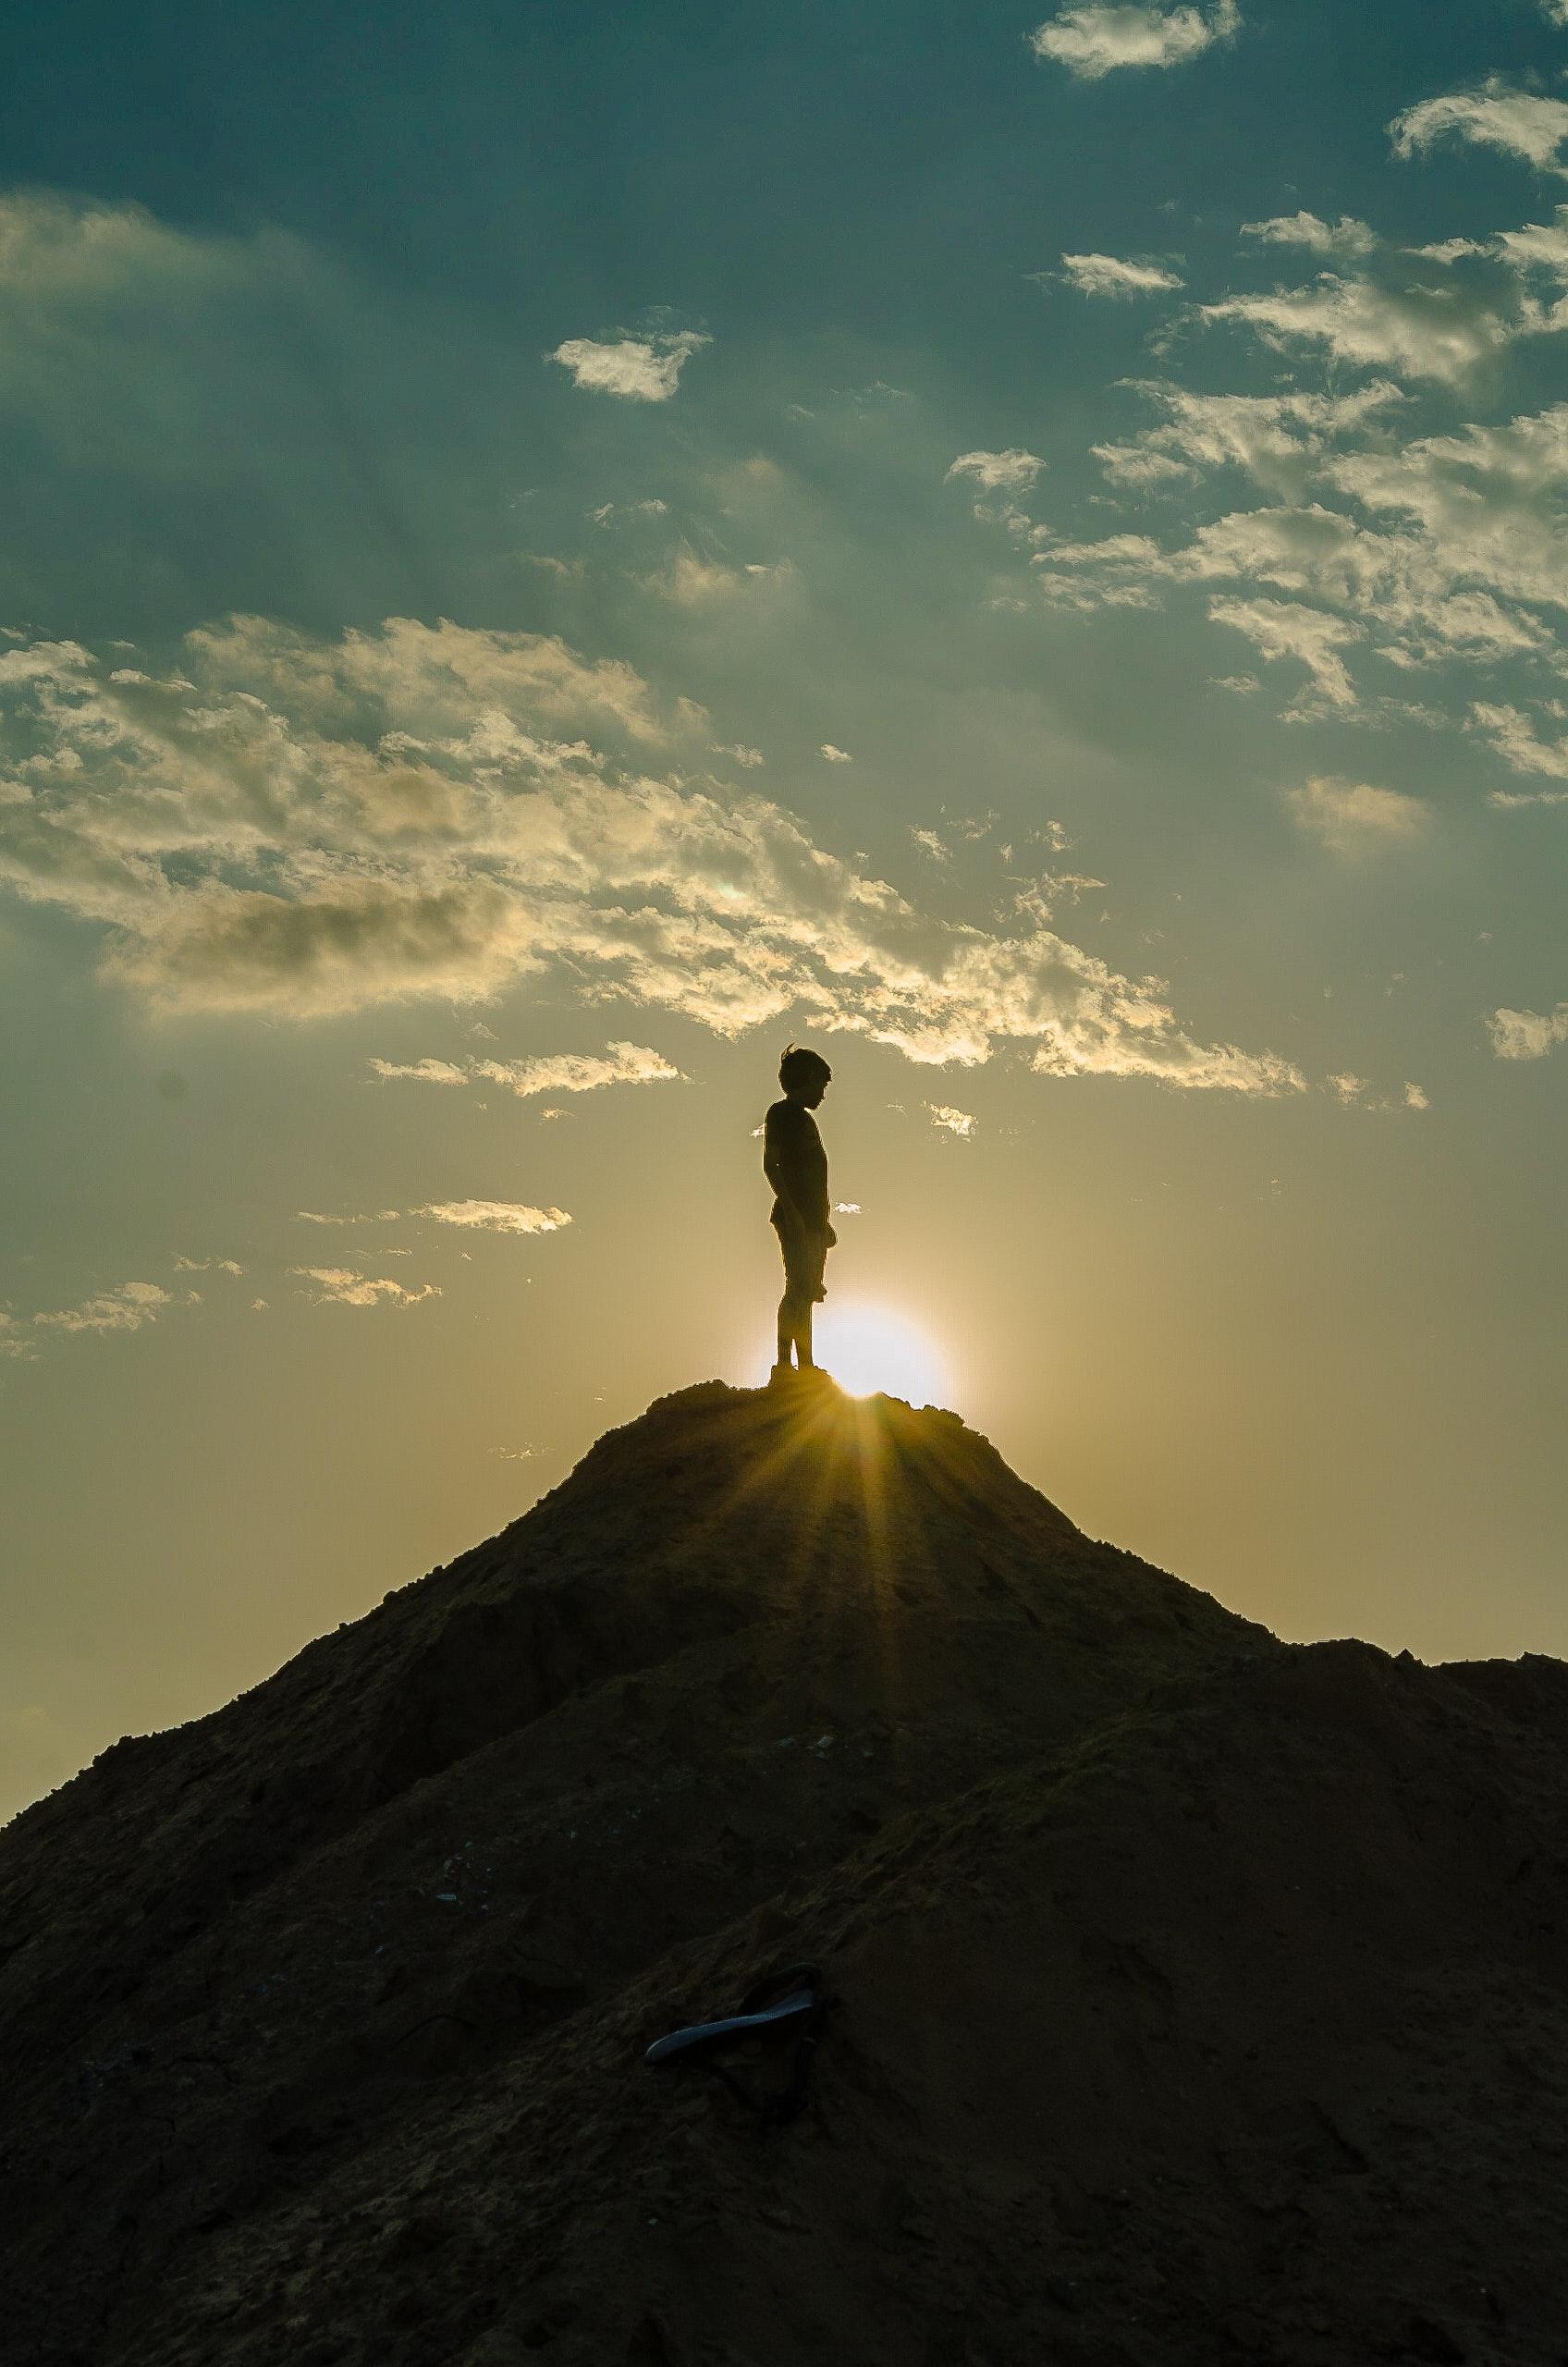 backlit-climb-climber-822421.jpg